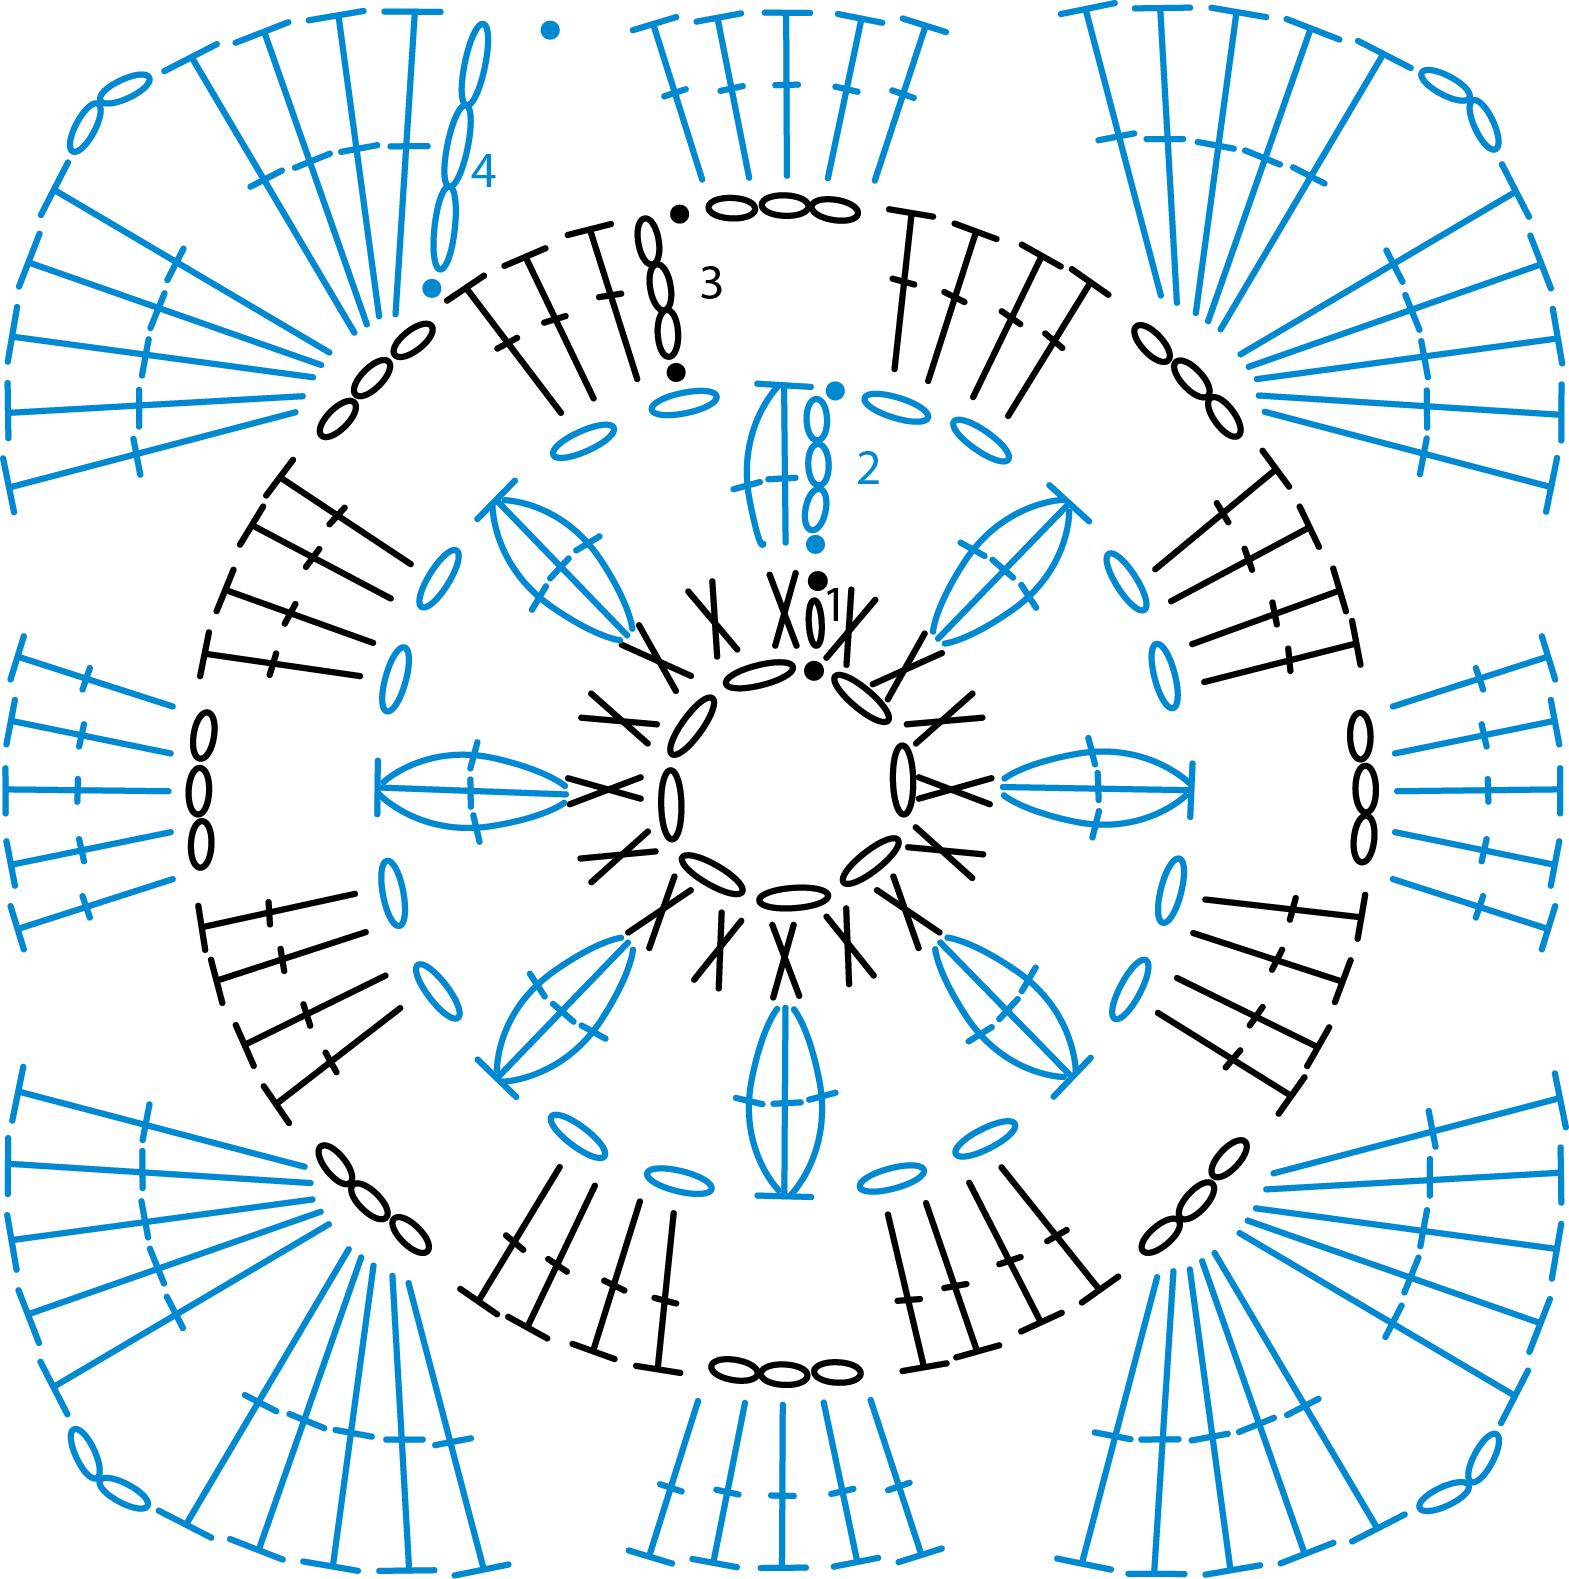 Crochet Granny Square Diagram 1999 Ford 4 6 Engine Scm App Chart15 Bs2 Motif